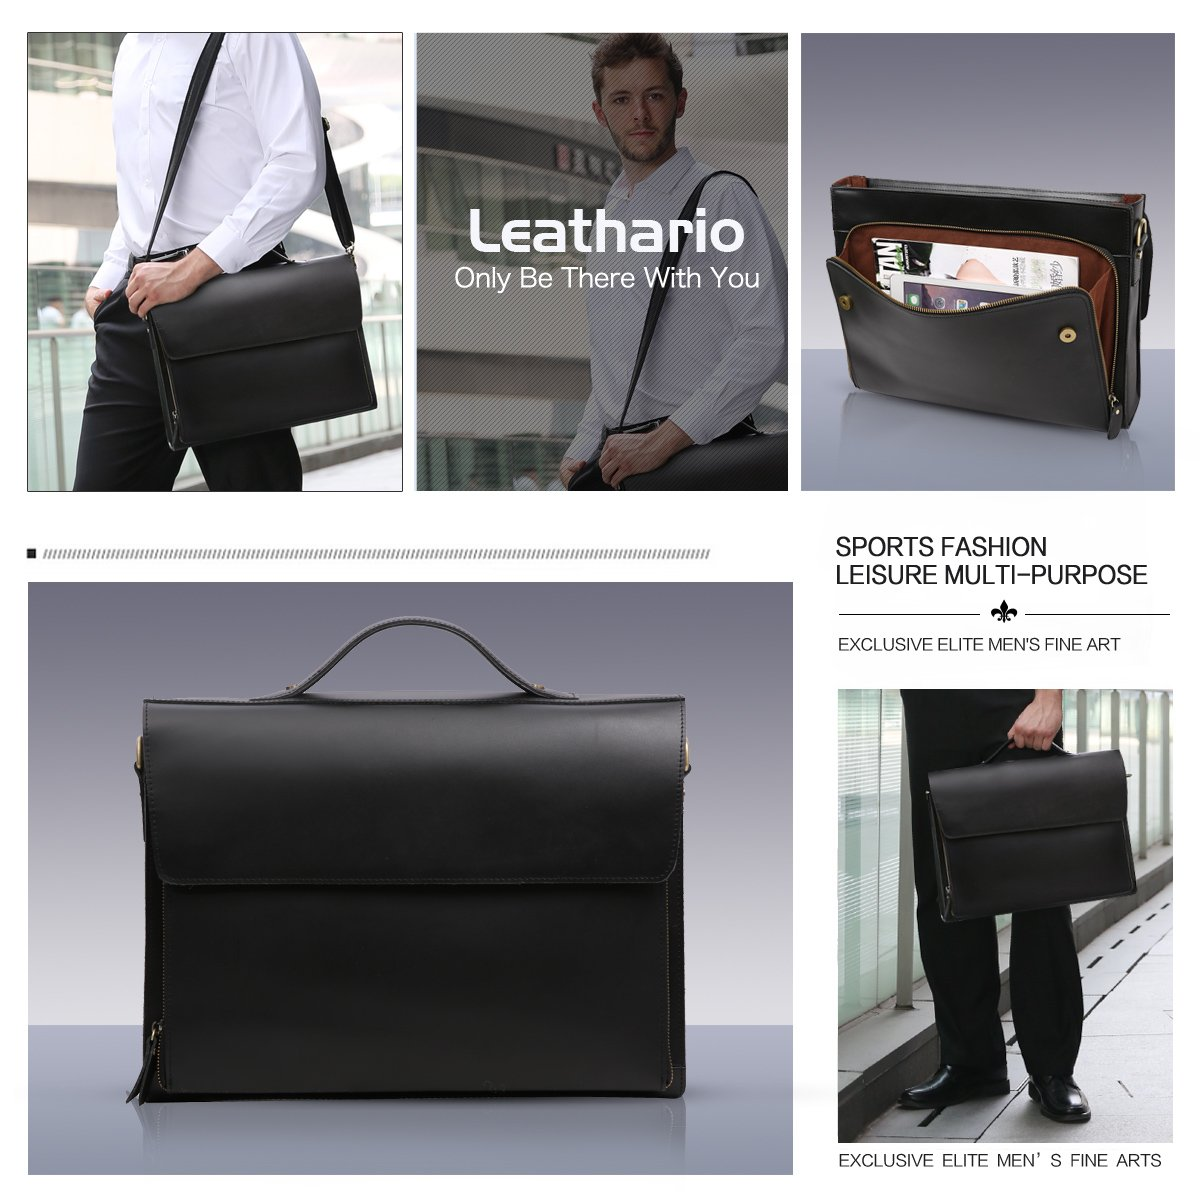 Leathario Leather Briefcase for Men Leather Laptop Bag Shoulder Messenger Bag Business Work Bag by Leathario (Image #6)